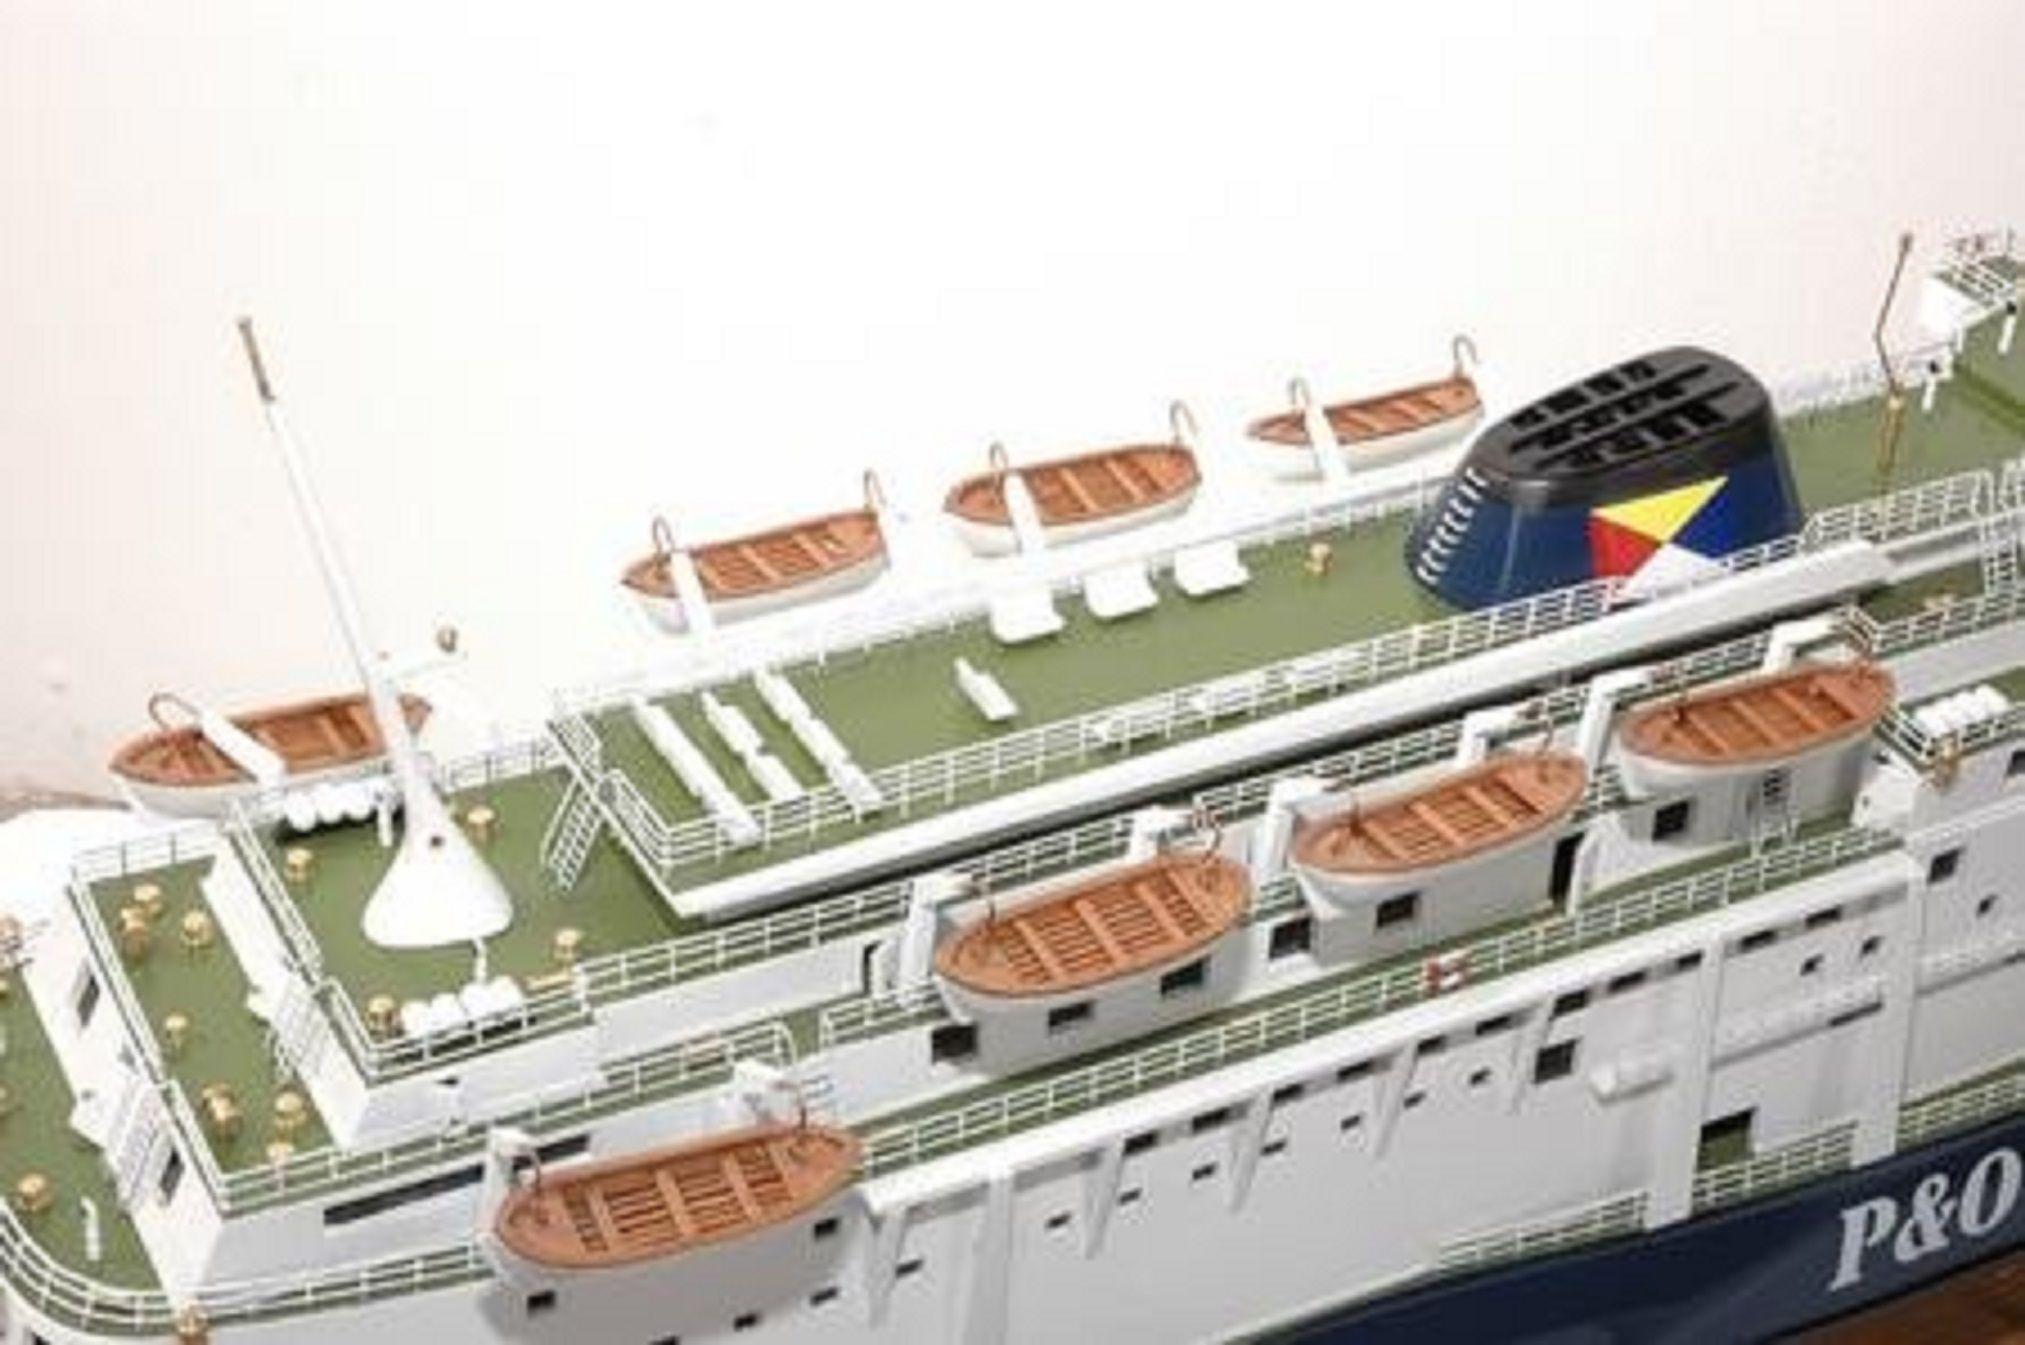 293-7553-P-O-model-ships-Pride-Aisla-and-Rathlin-Premier-Range